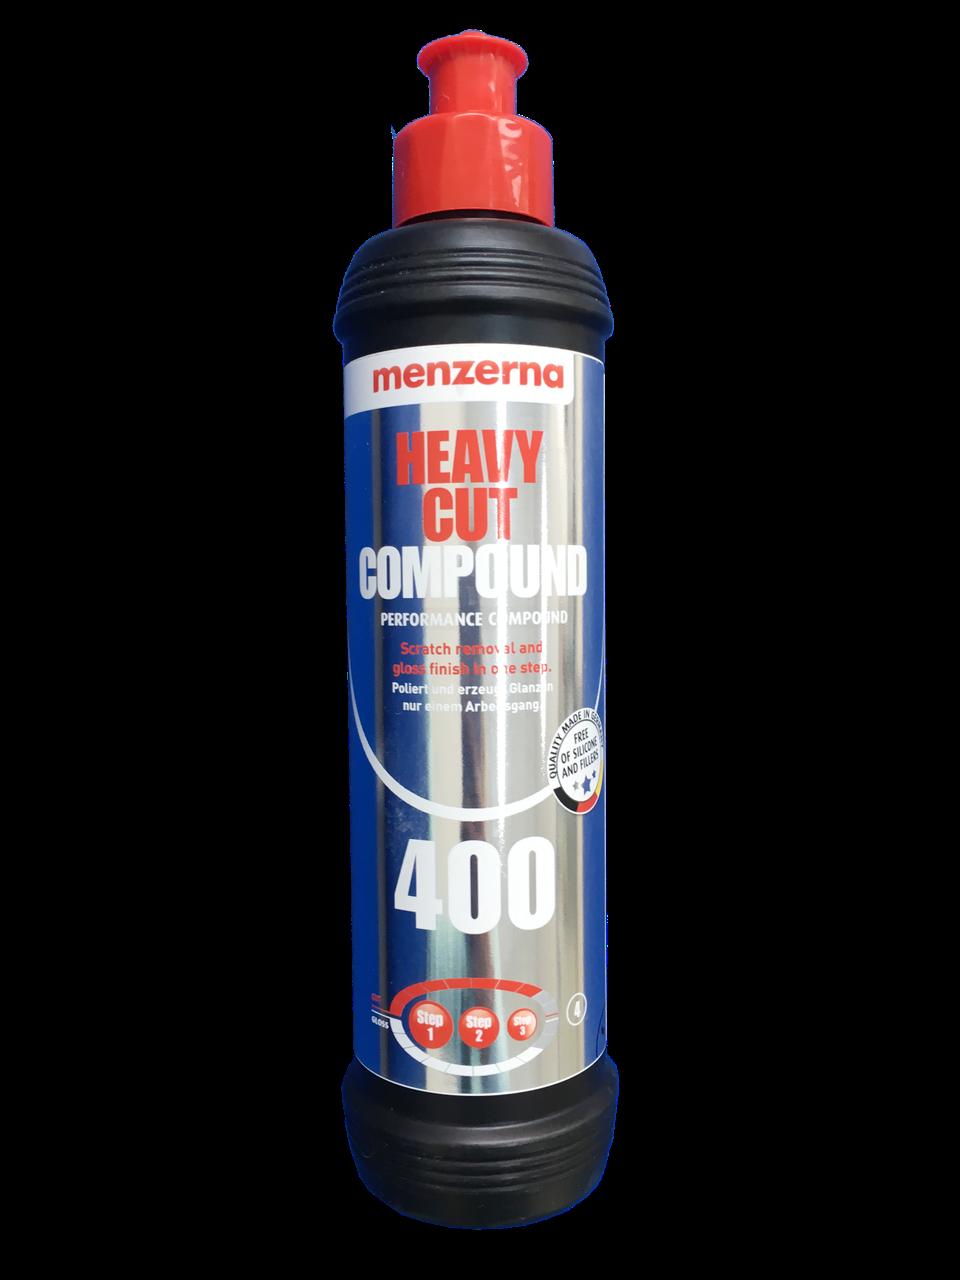 Полірувальна паста грубозерниста - Menzerna Heavy Cut Compound 400 250 мл (22759.281.001)